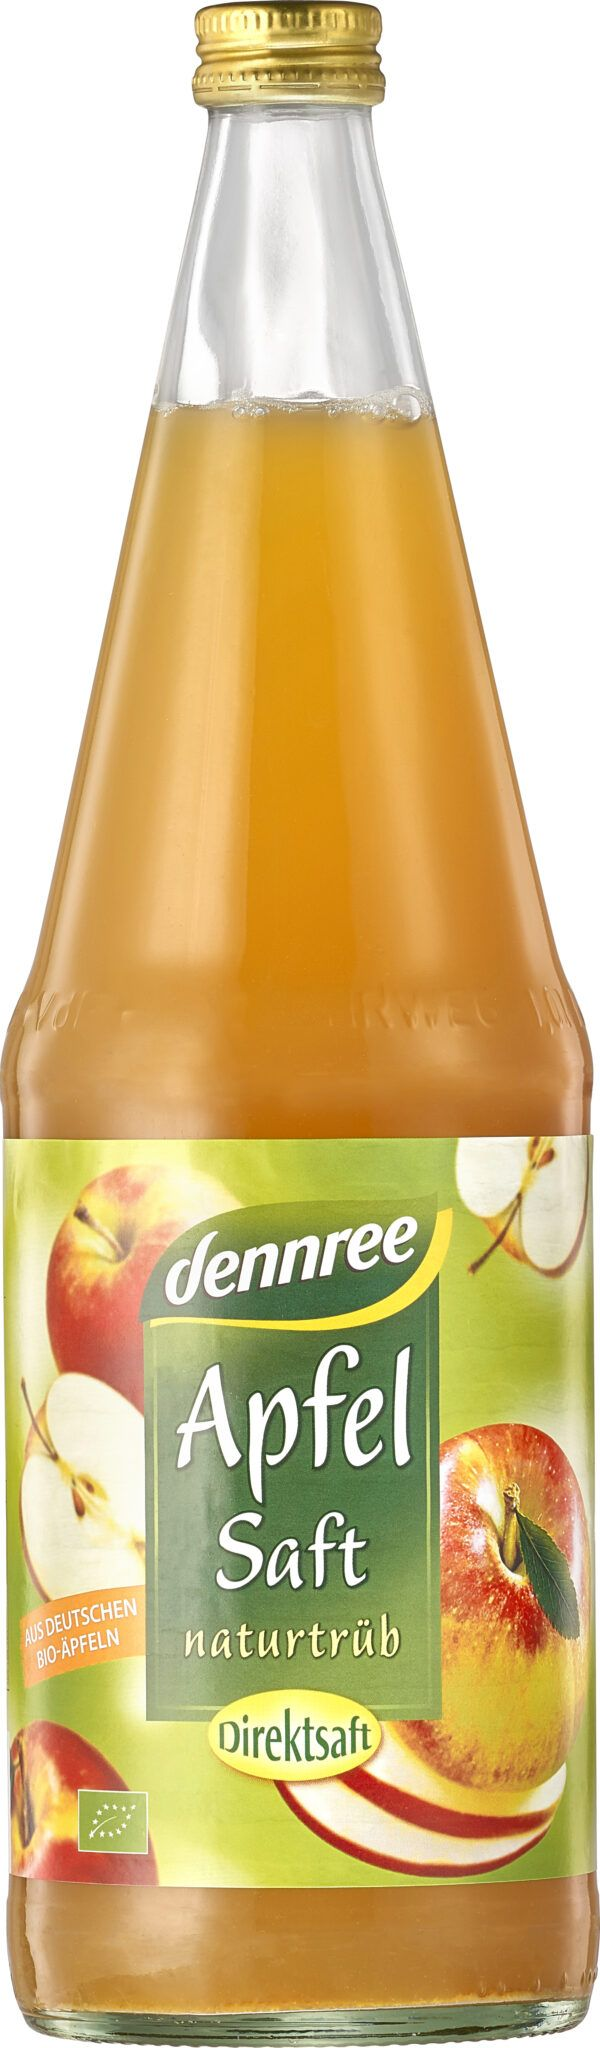 dennree Apfelsaft naturtrüb, Direktsaft 6x1l